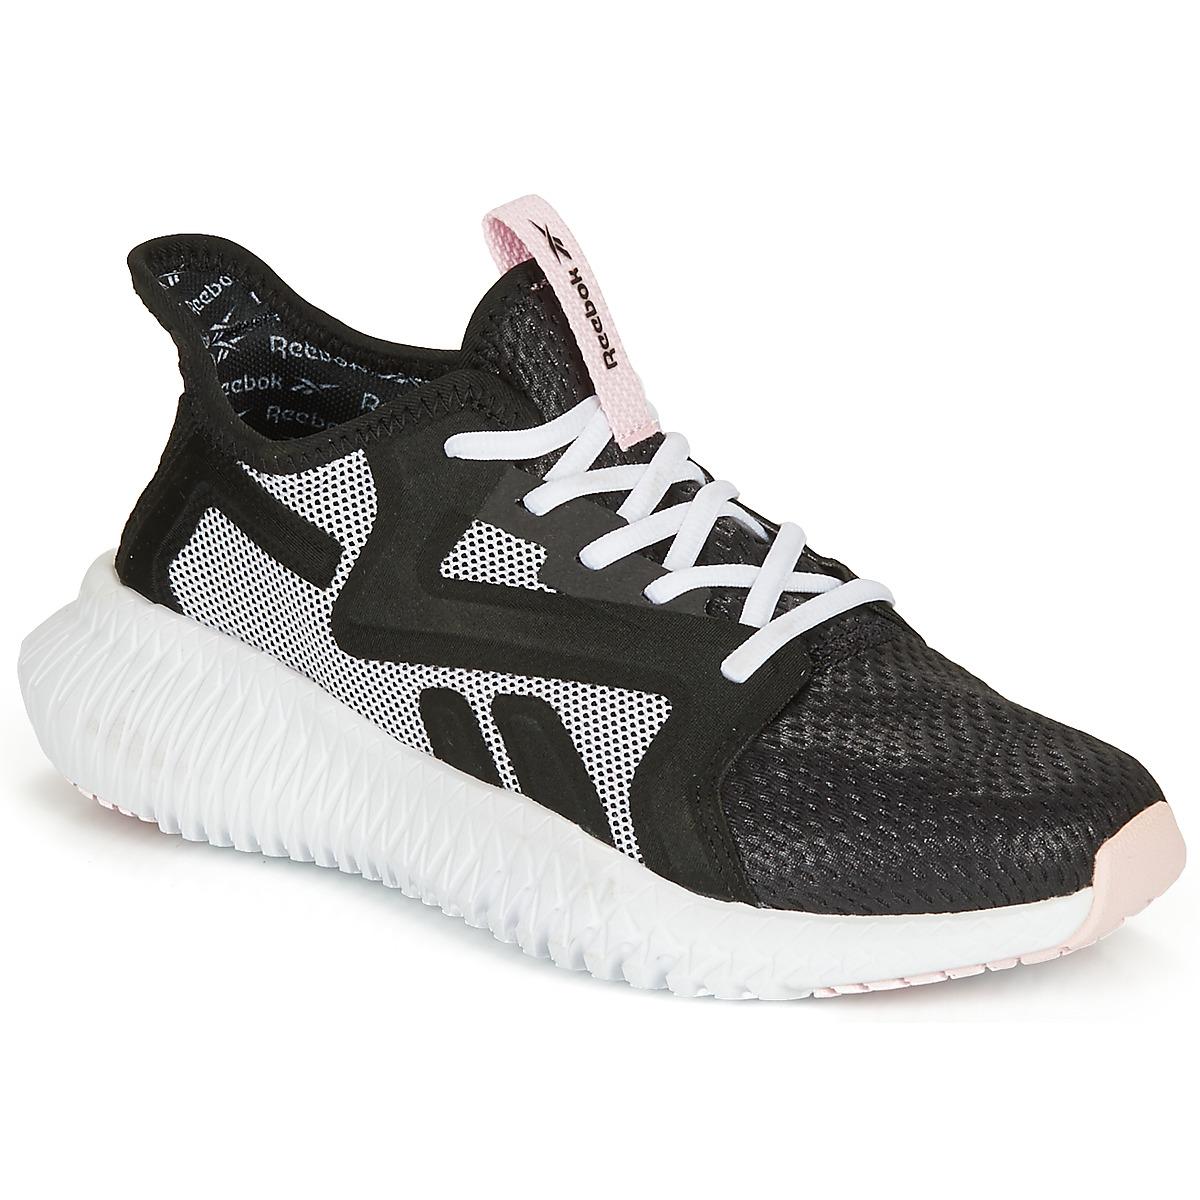 reebok sports running shoes Online